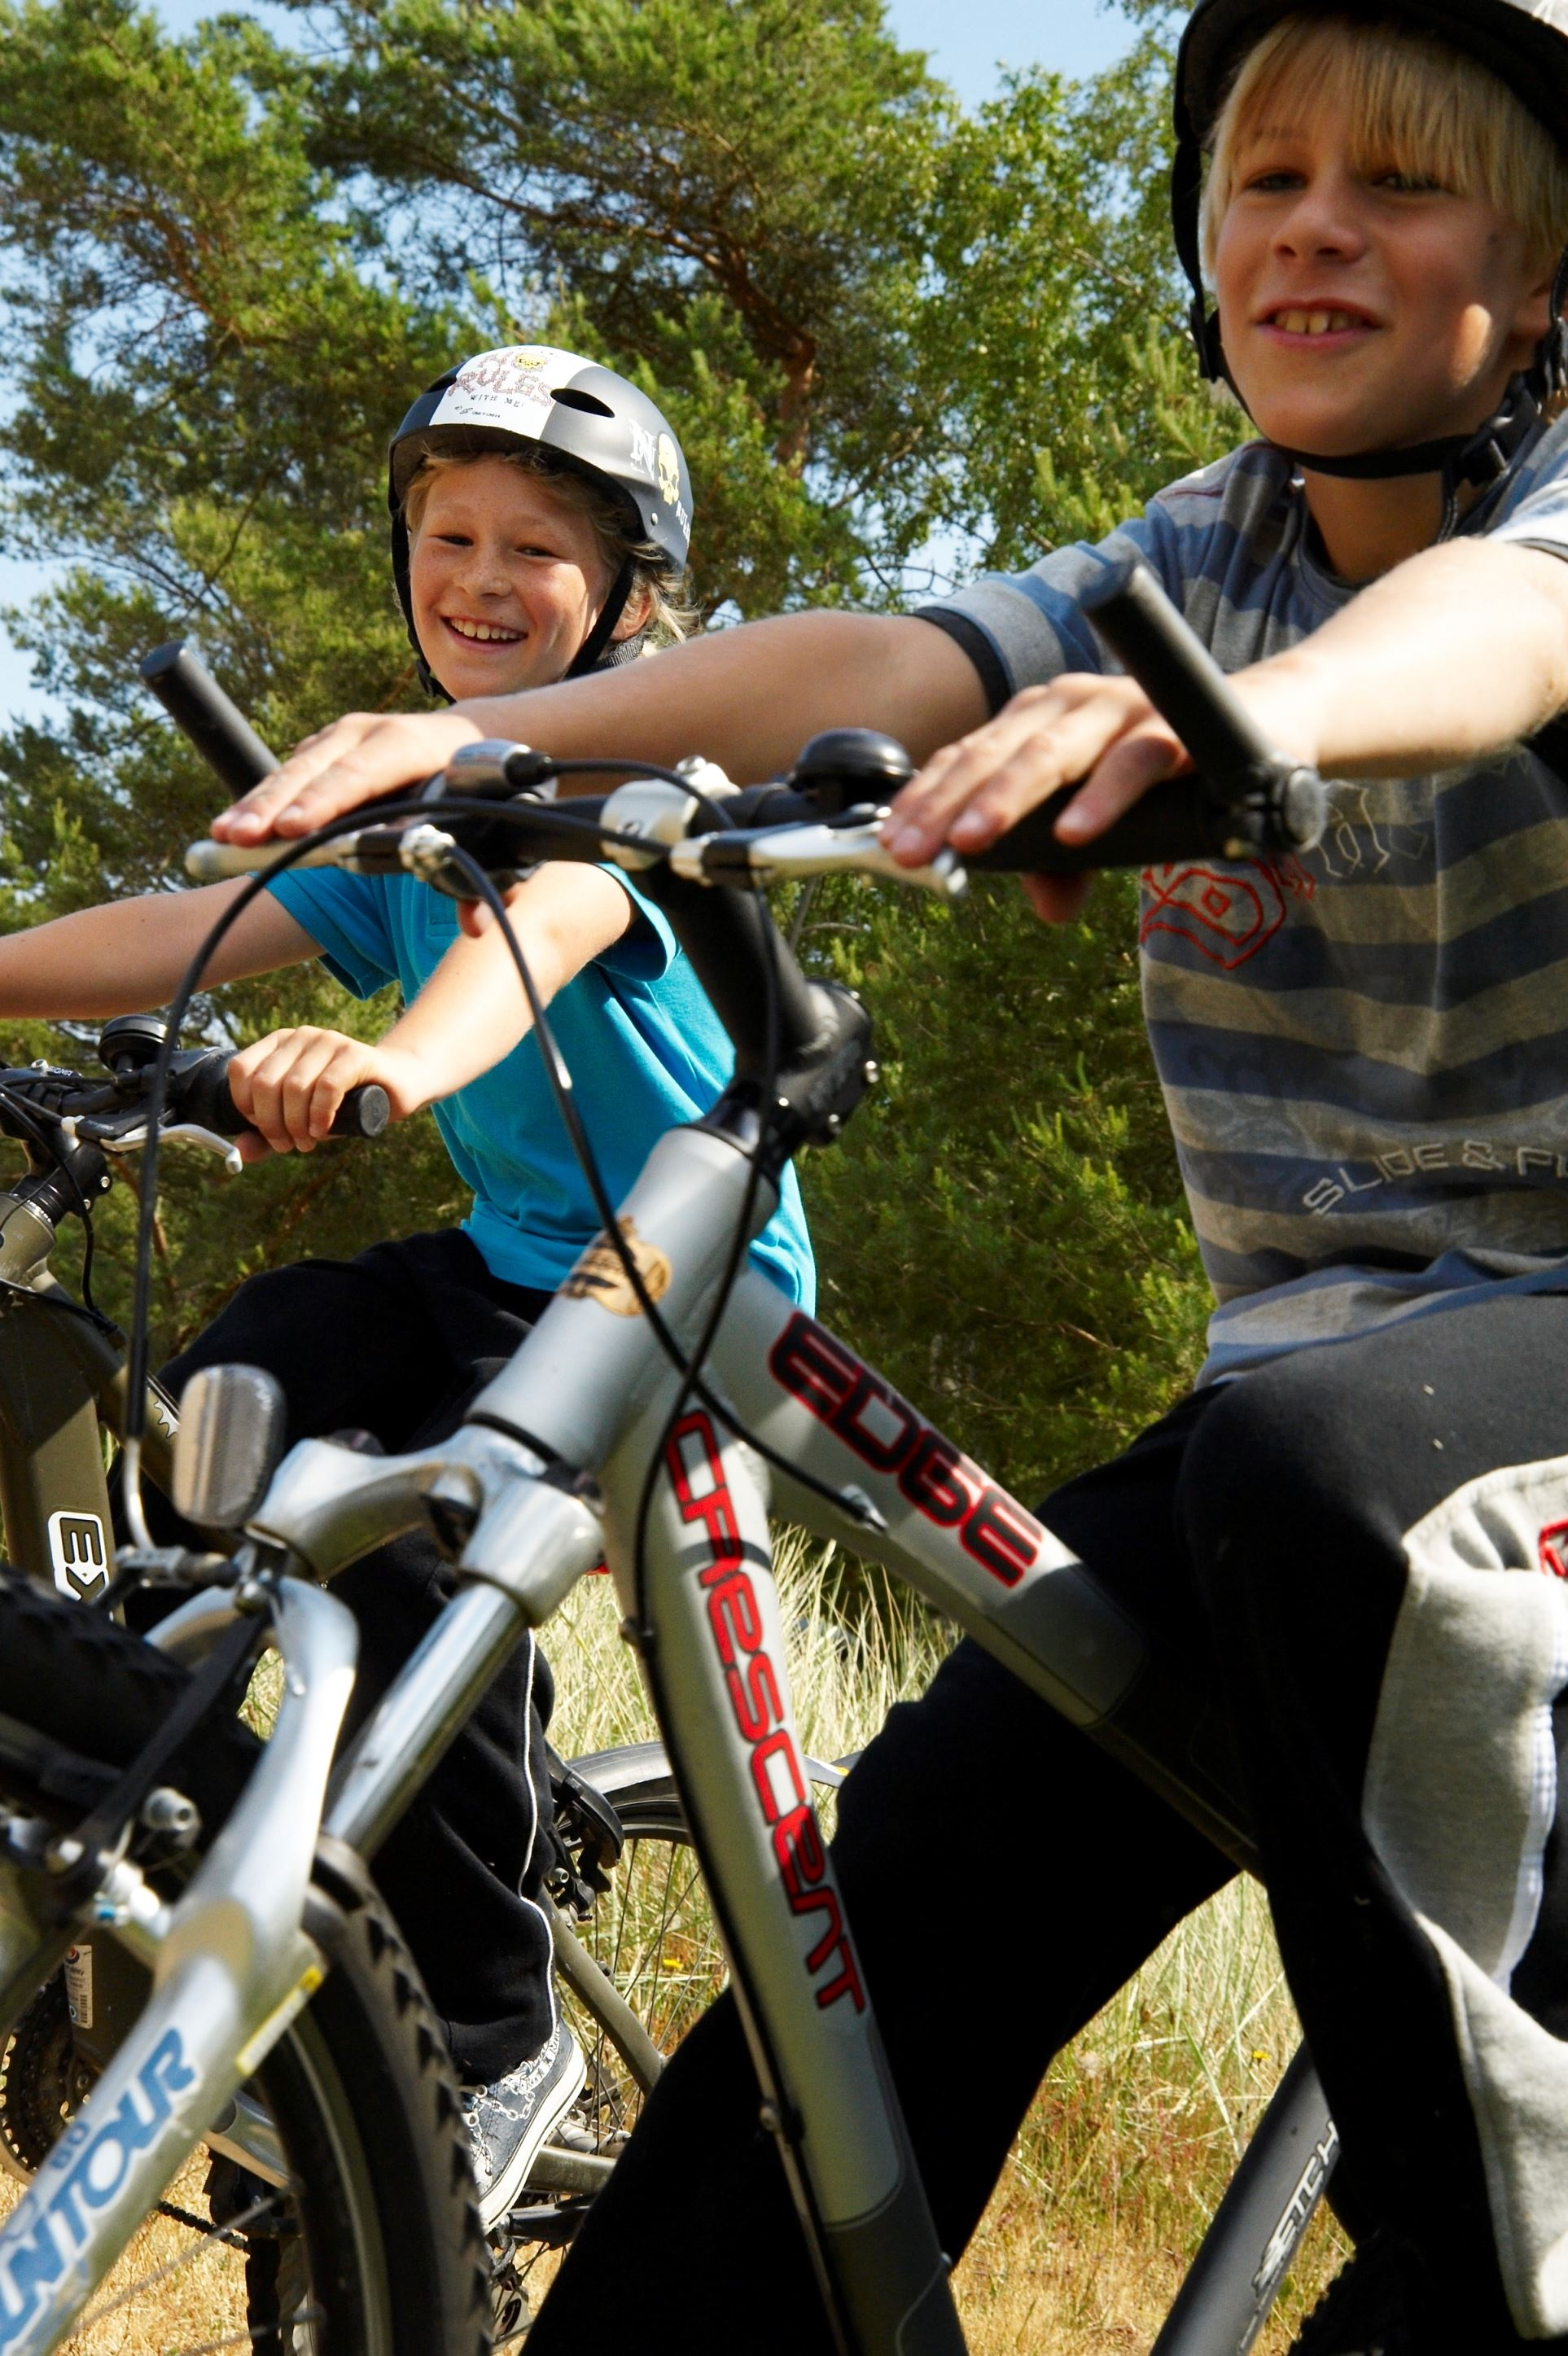 Fahrradverleih - Cykelcentralen AB - Krokås